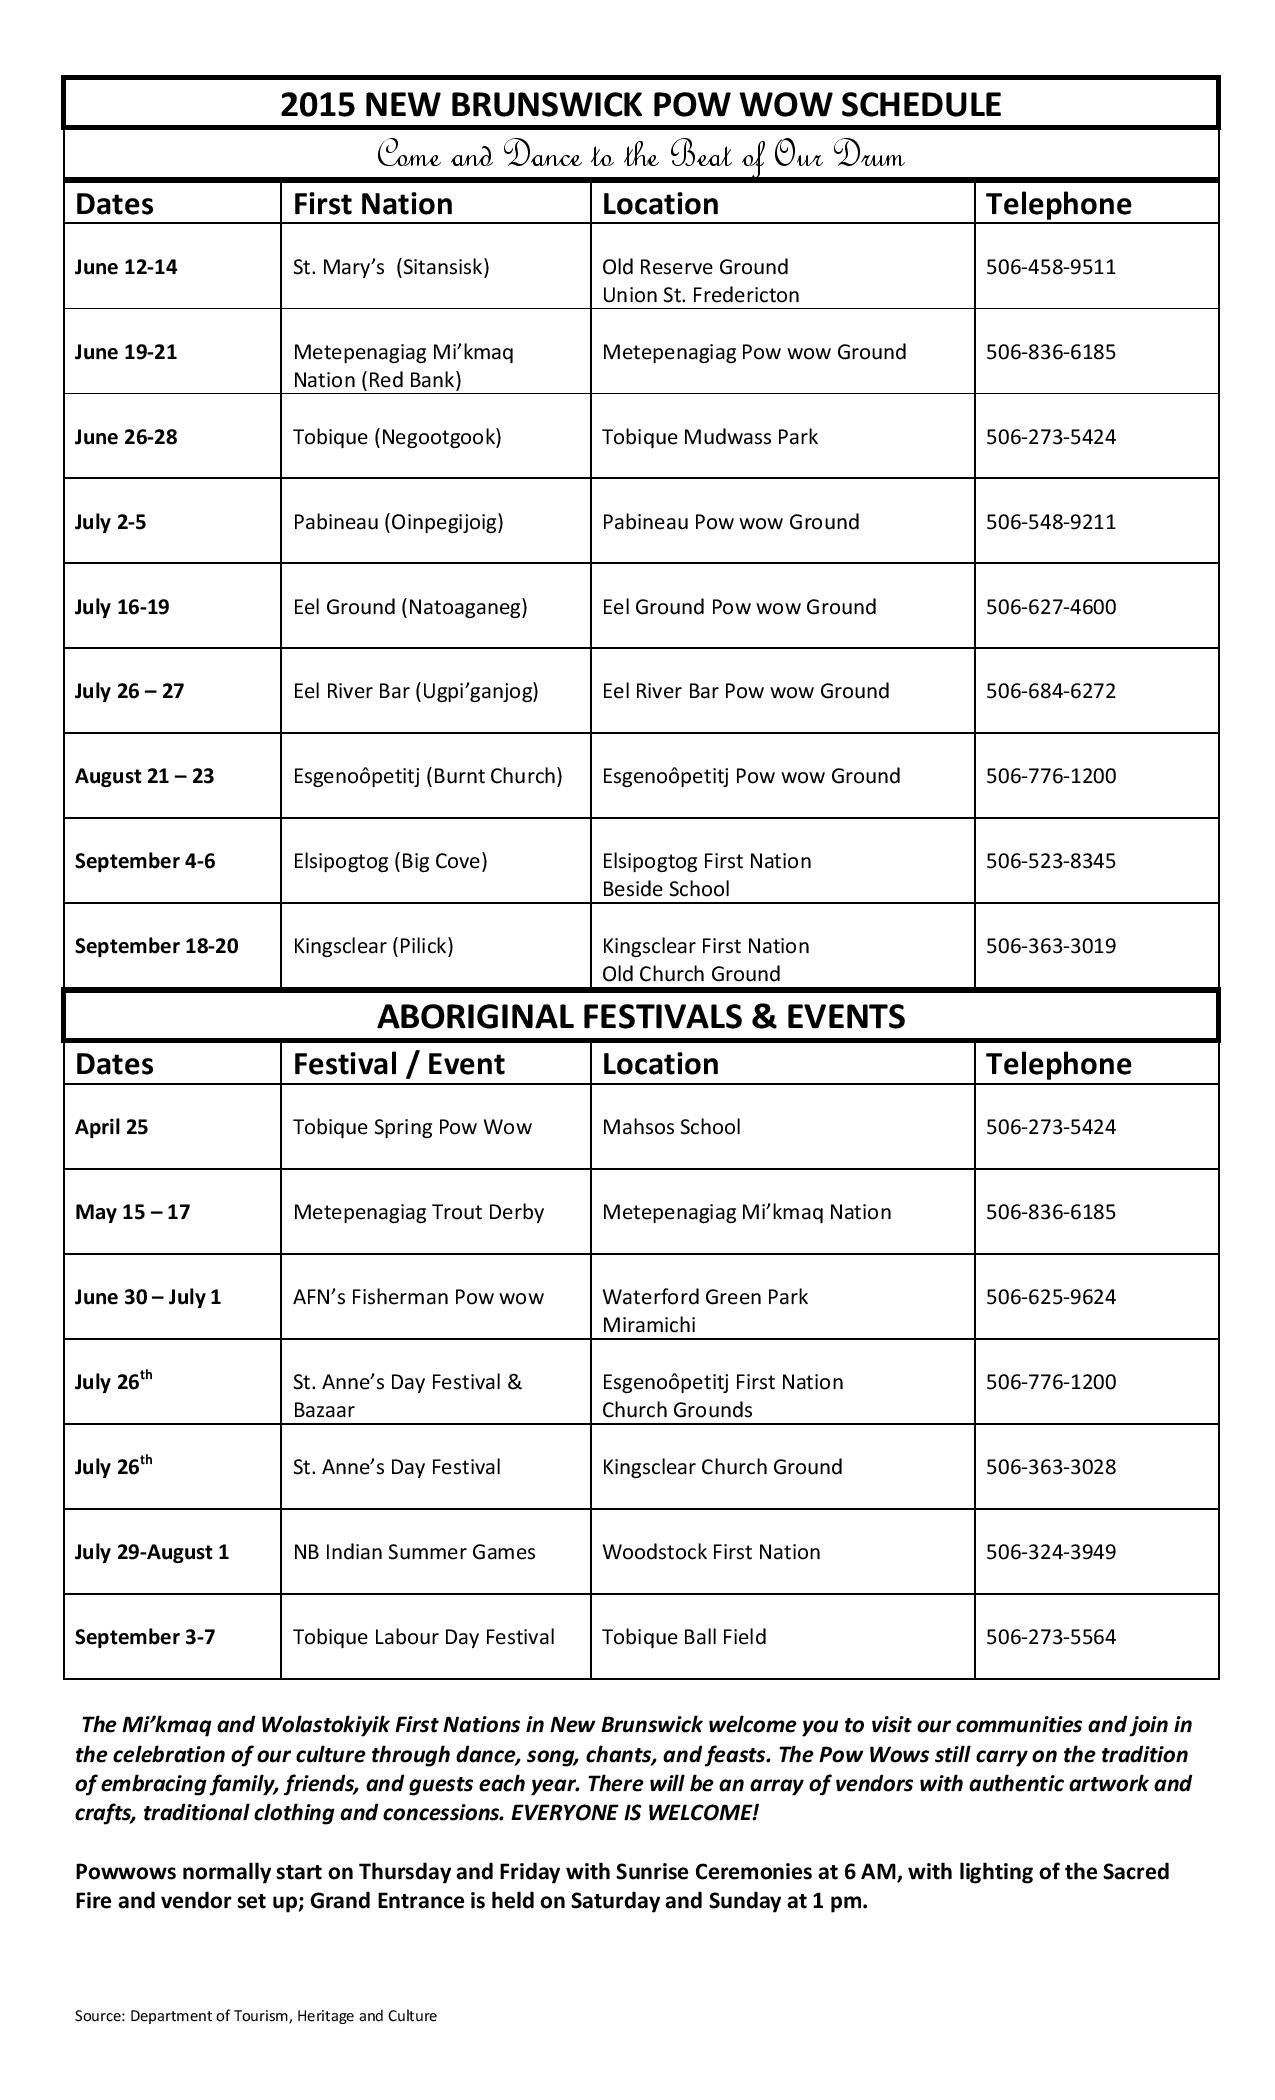 New Brunswick Pow Wow Schedule 2015